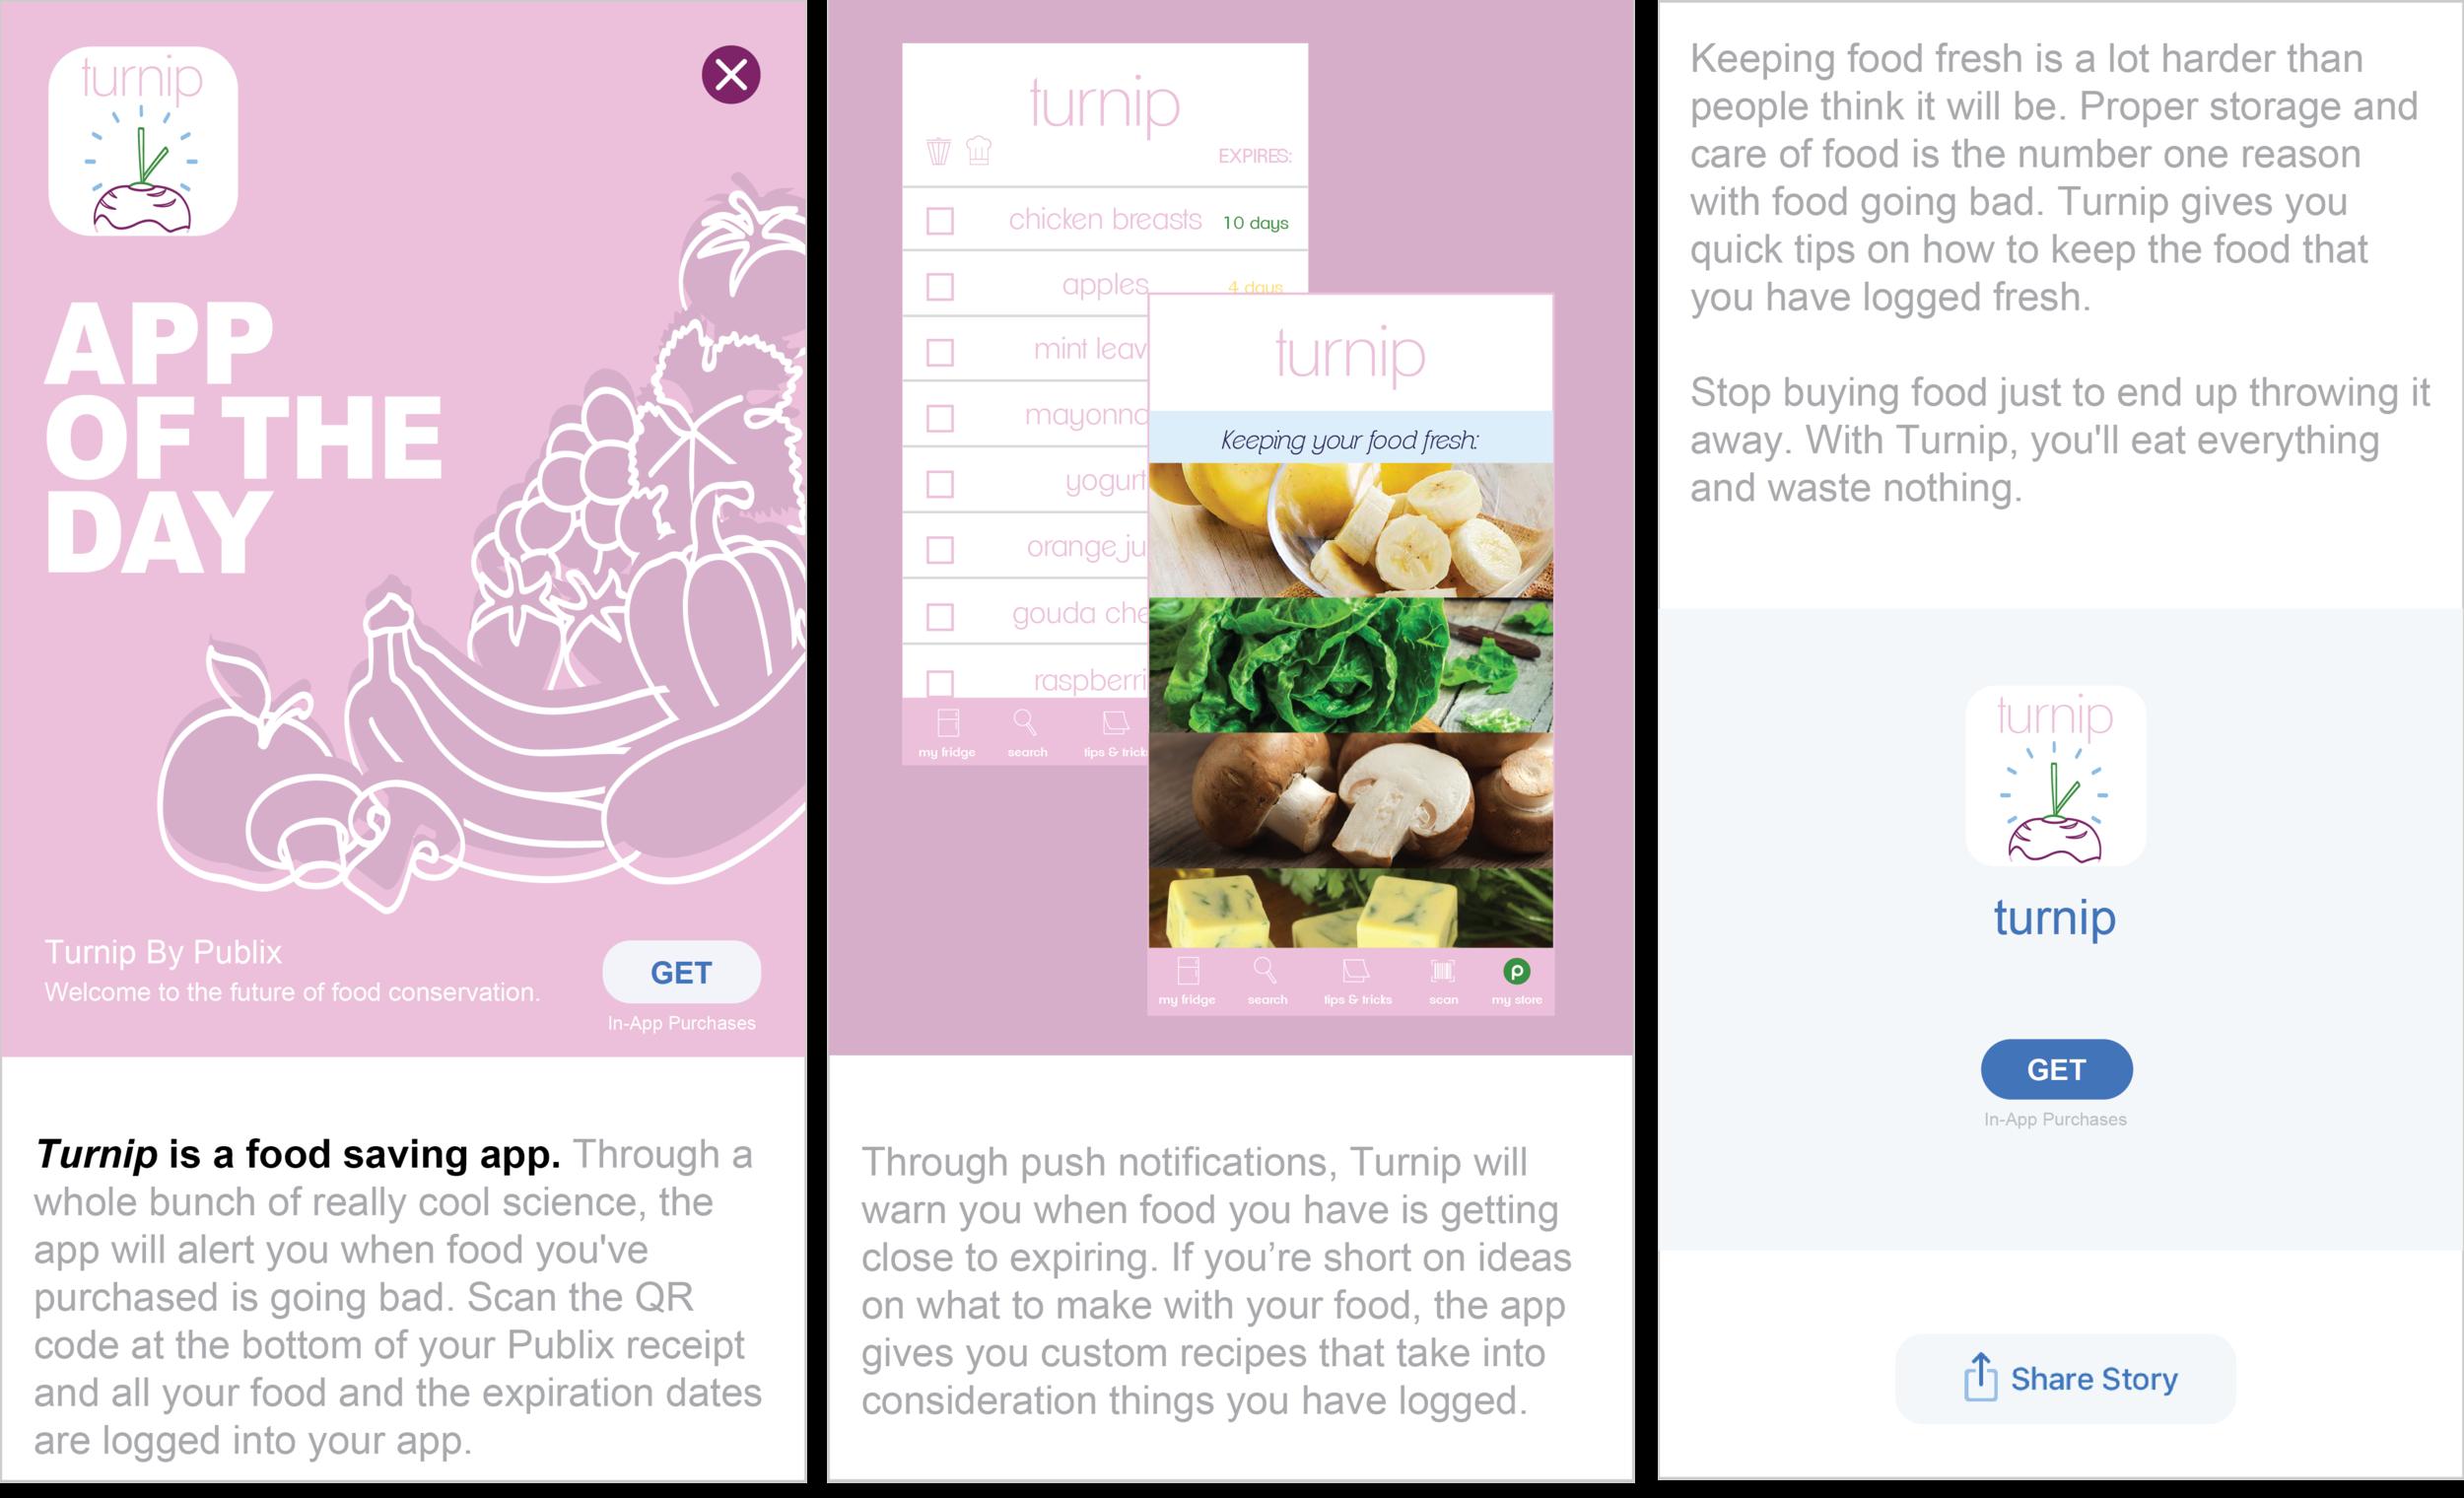 turnip app write up-2.png